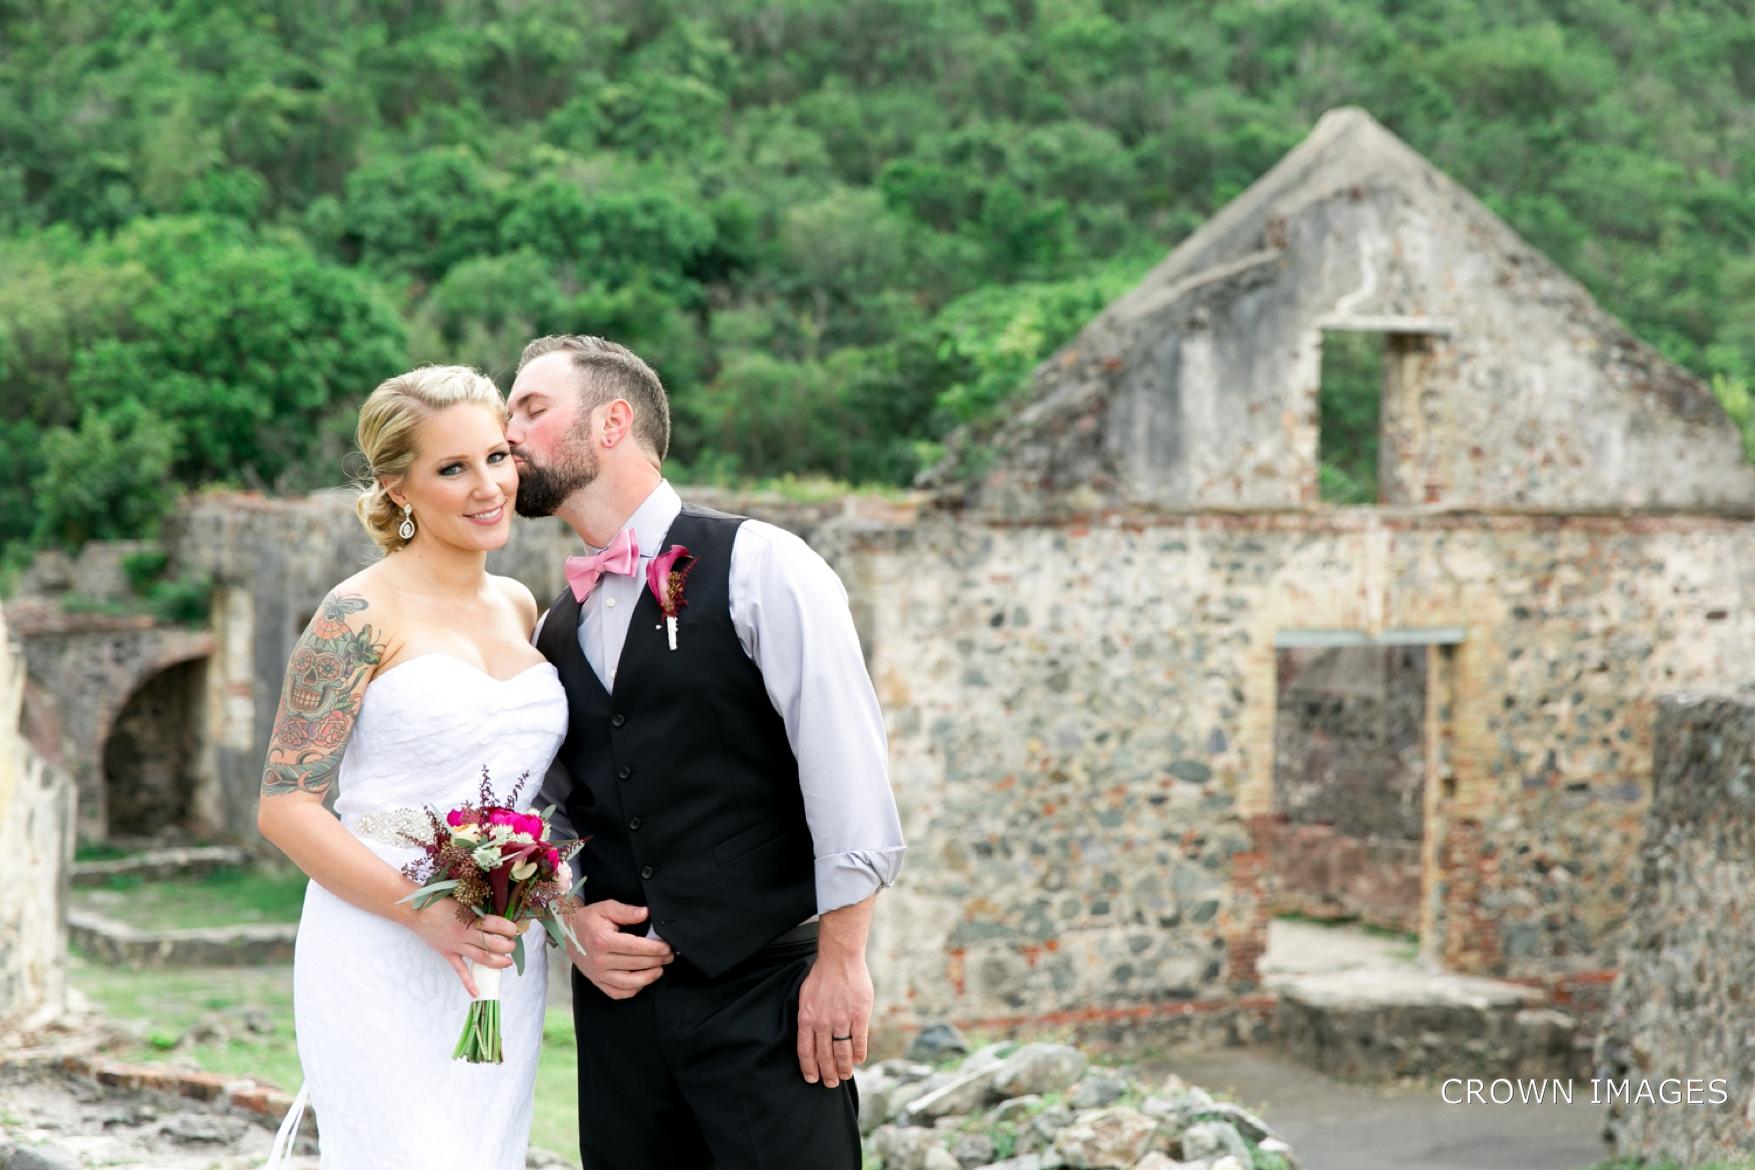 st_john_wedding_photographer_0507.jpg